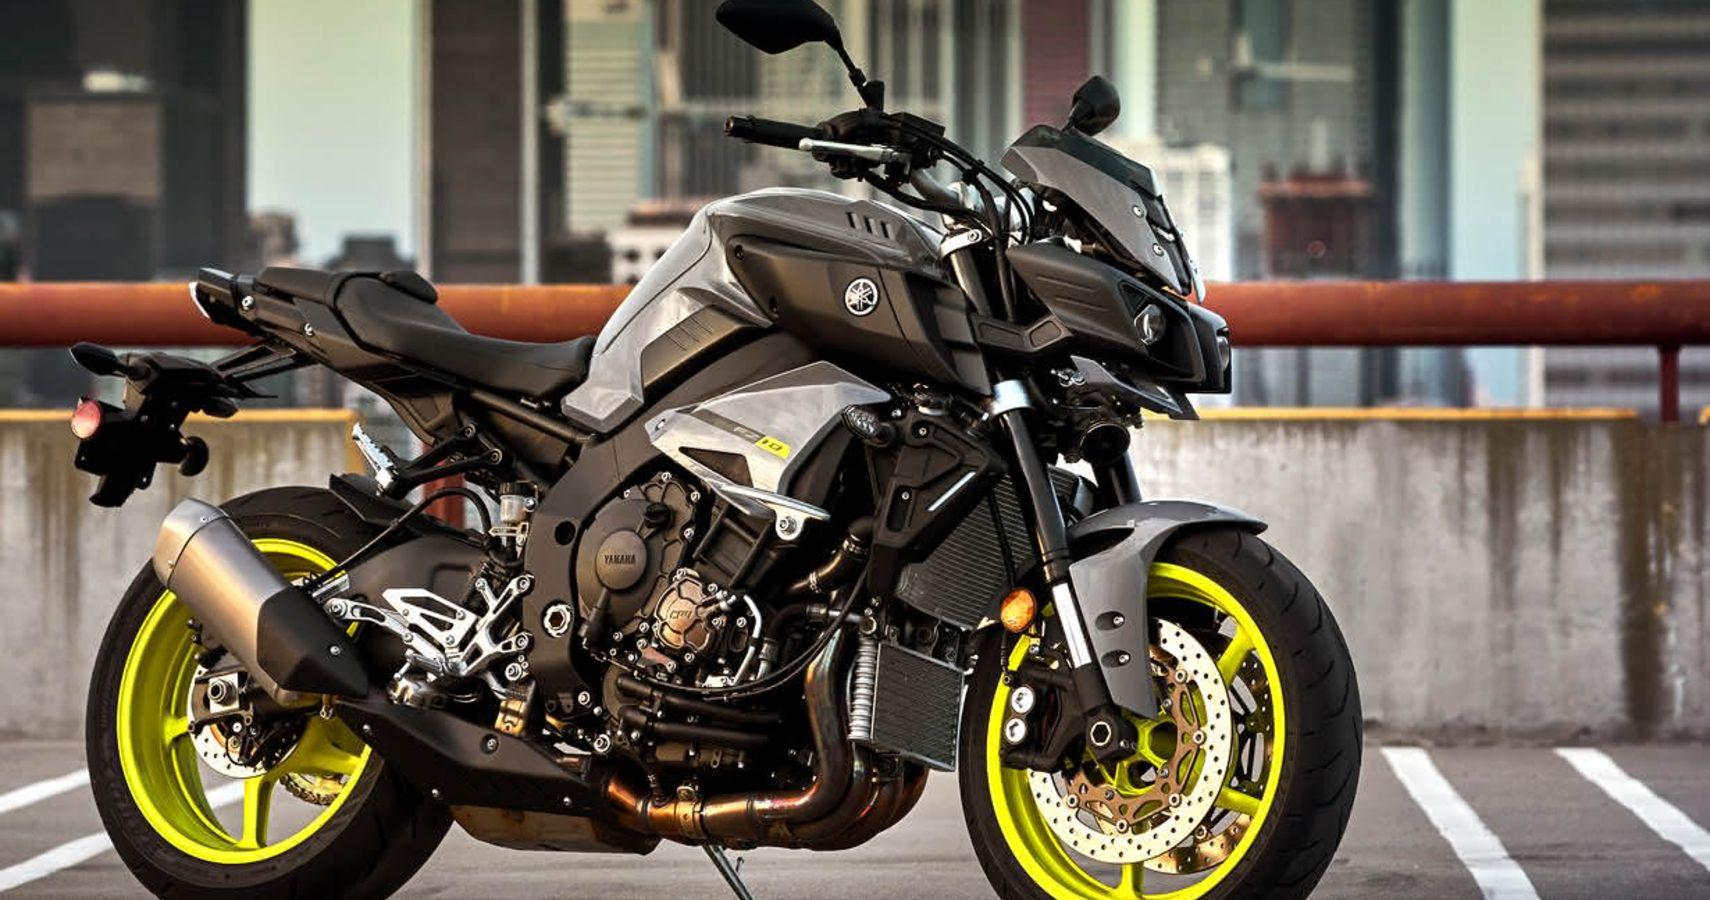 New Model Yamaha MT-10 2020: Price, Consumption and Photos